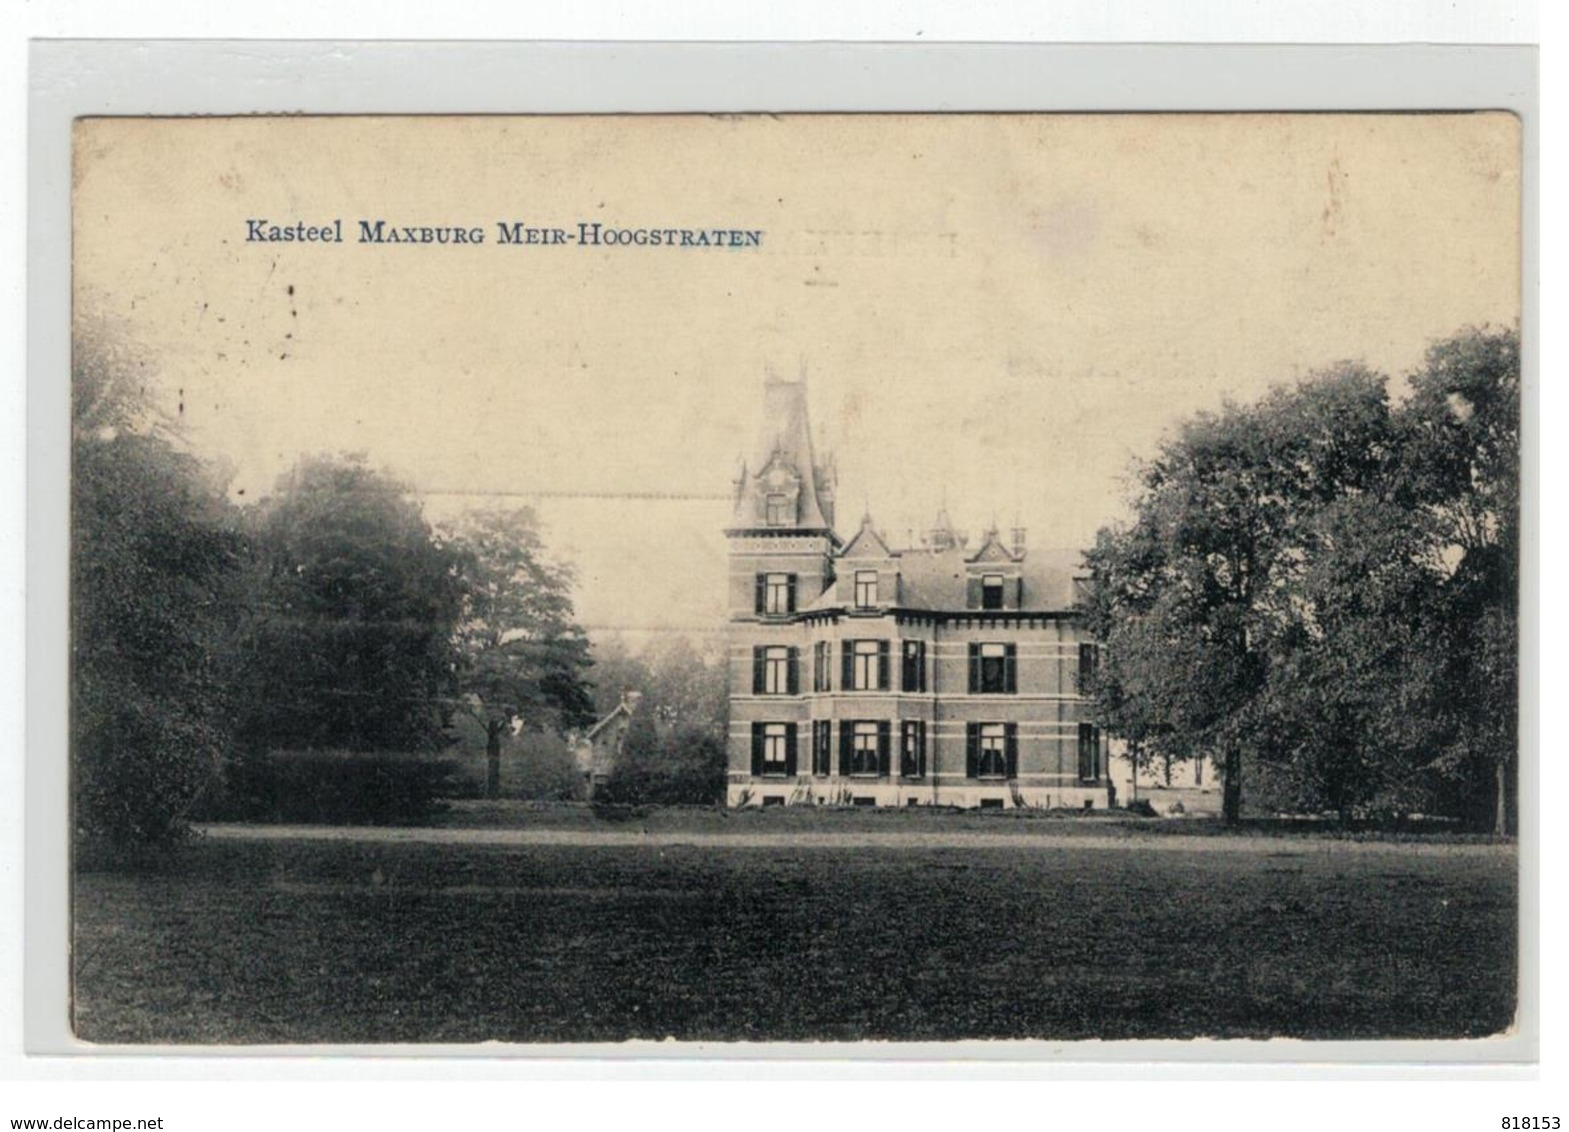 Hoogsraten  Kasteel MAXBURG MEIR-HOOGSTRATEN  1910 - Hoogstraten